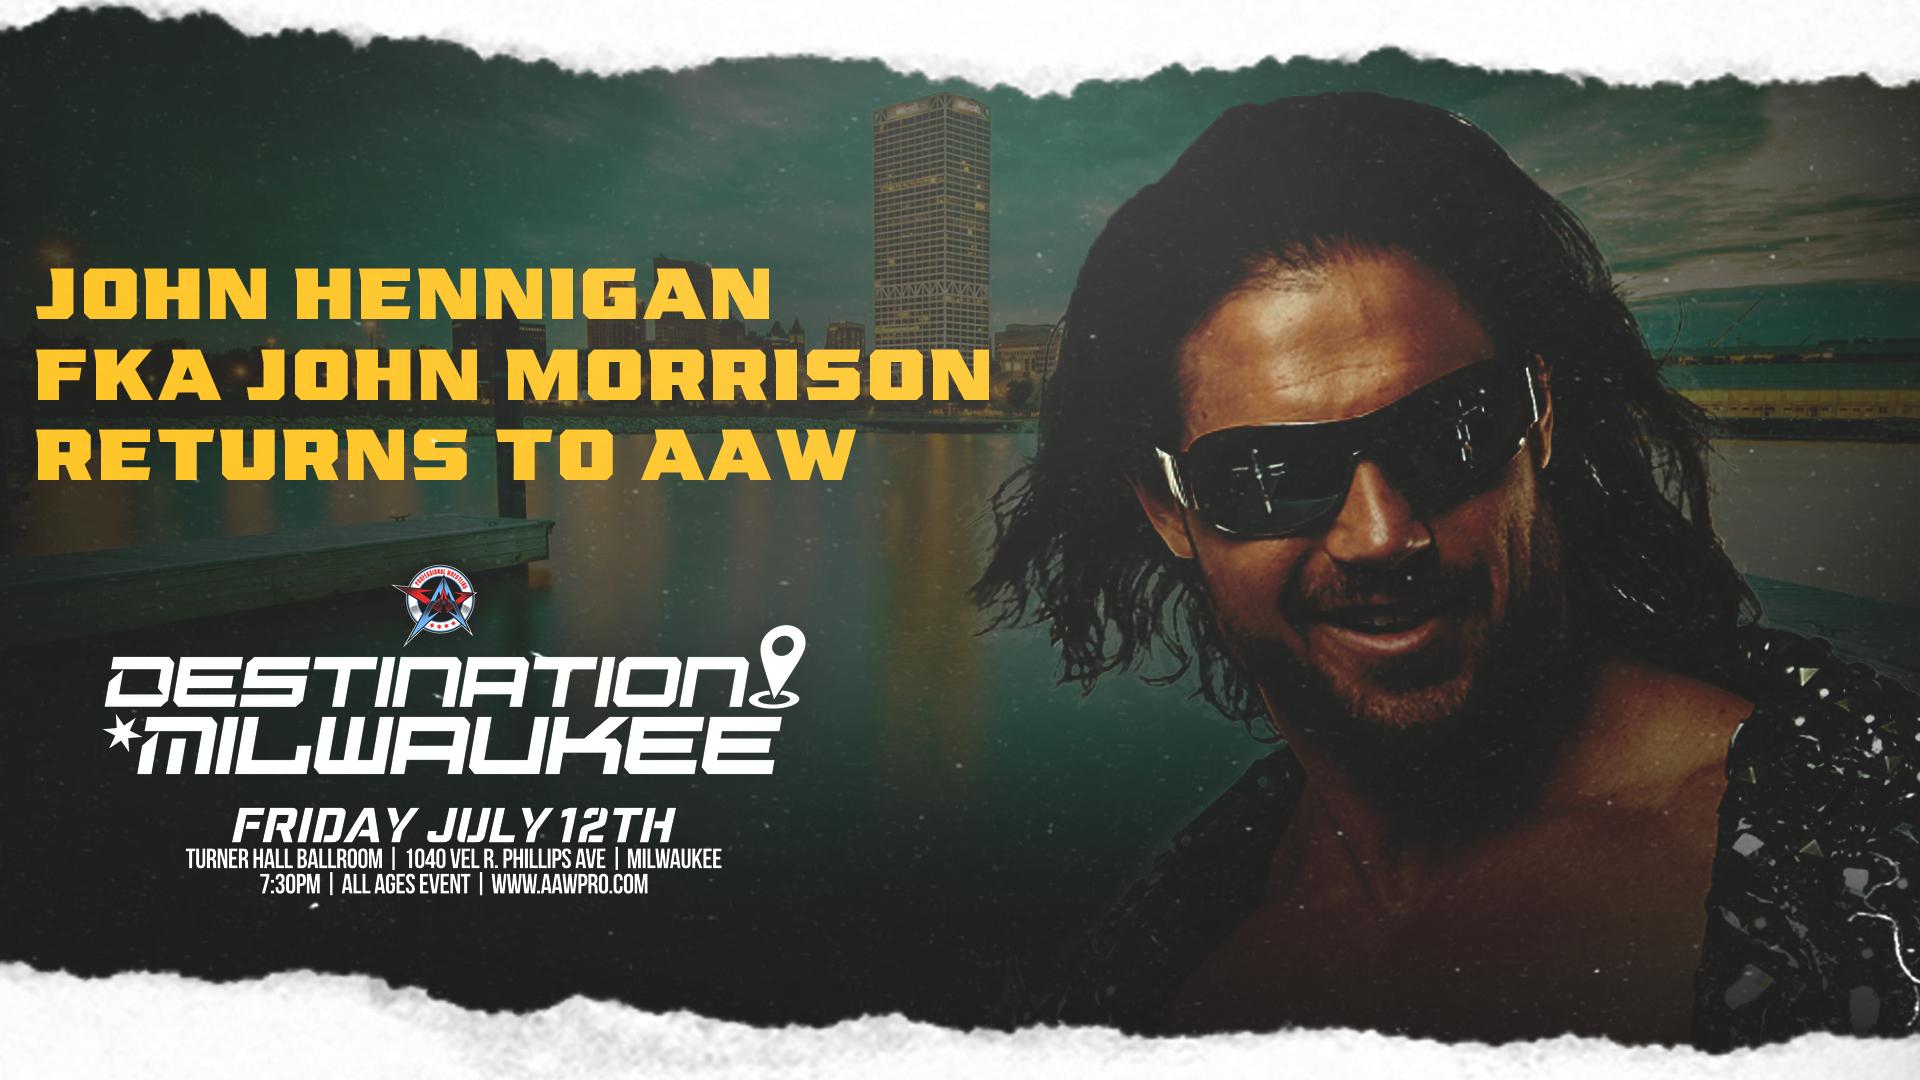 John Hennigan FKA John Morrison Returns At Destination Milwaukee